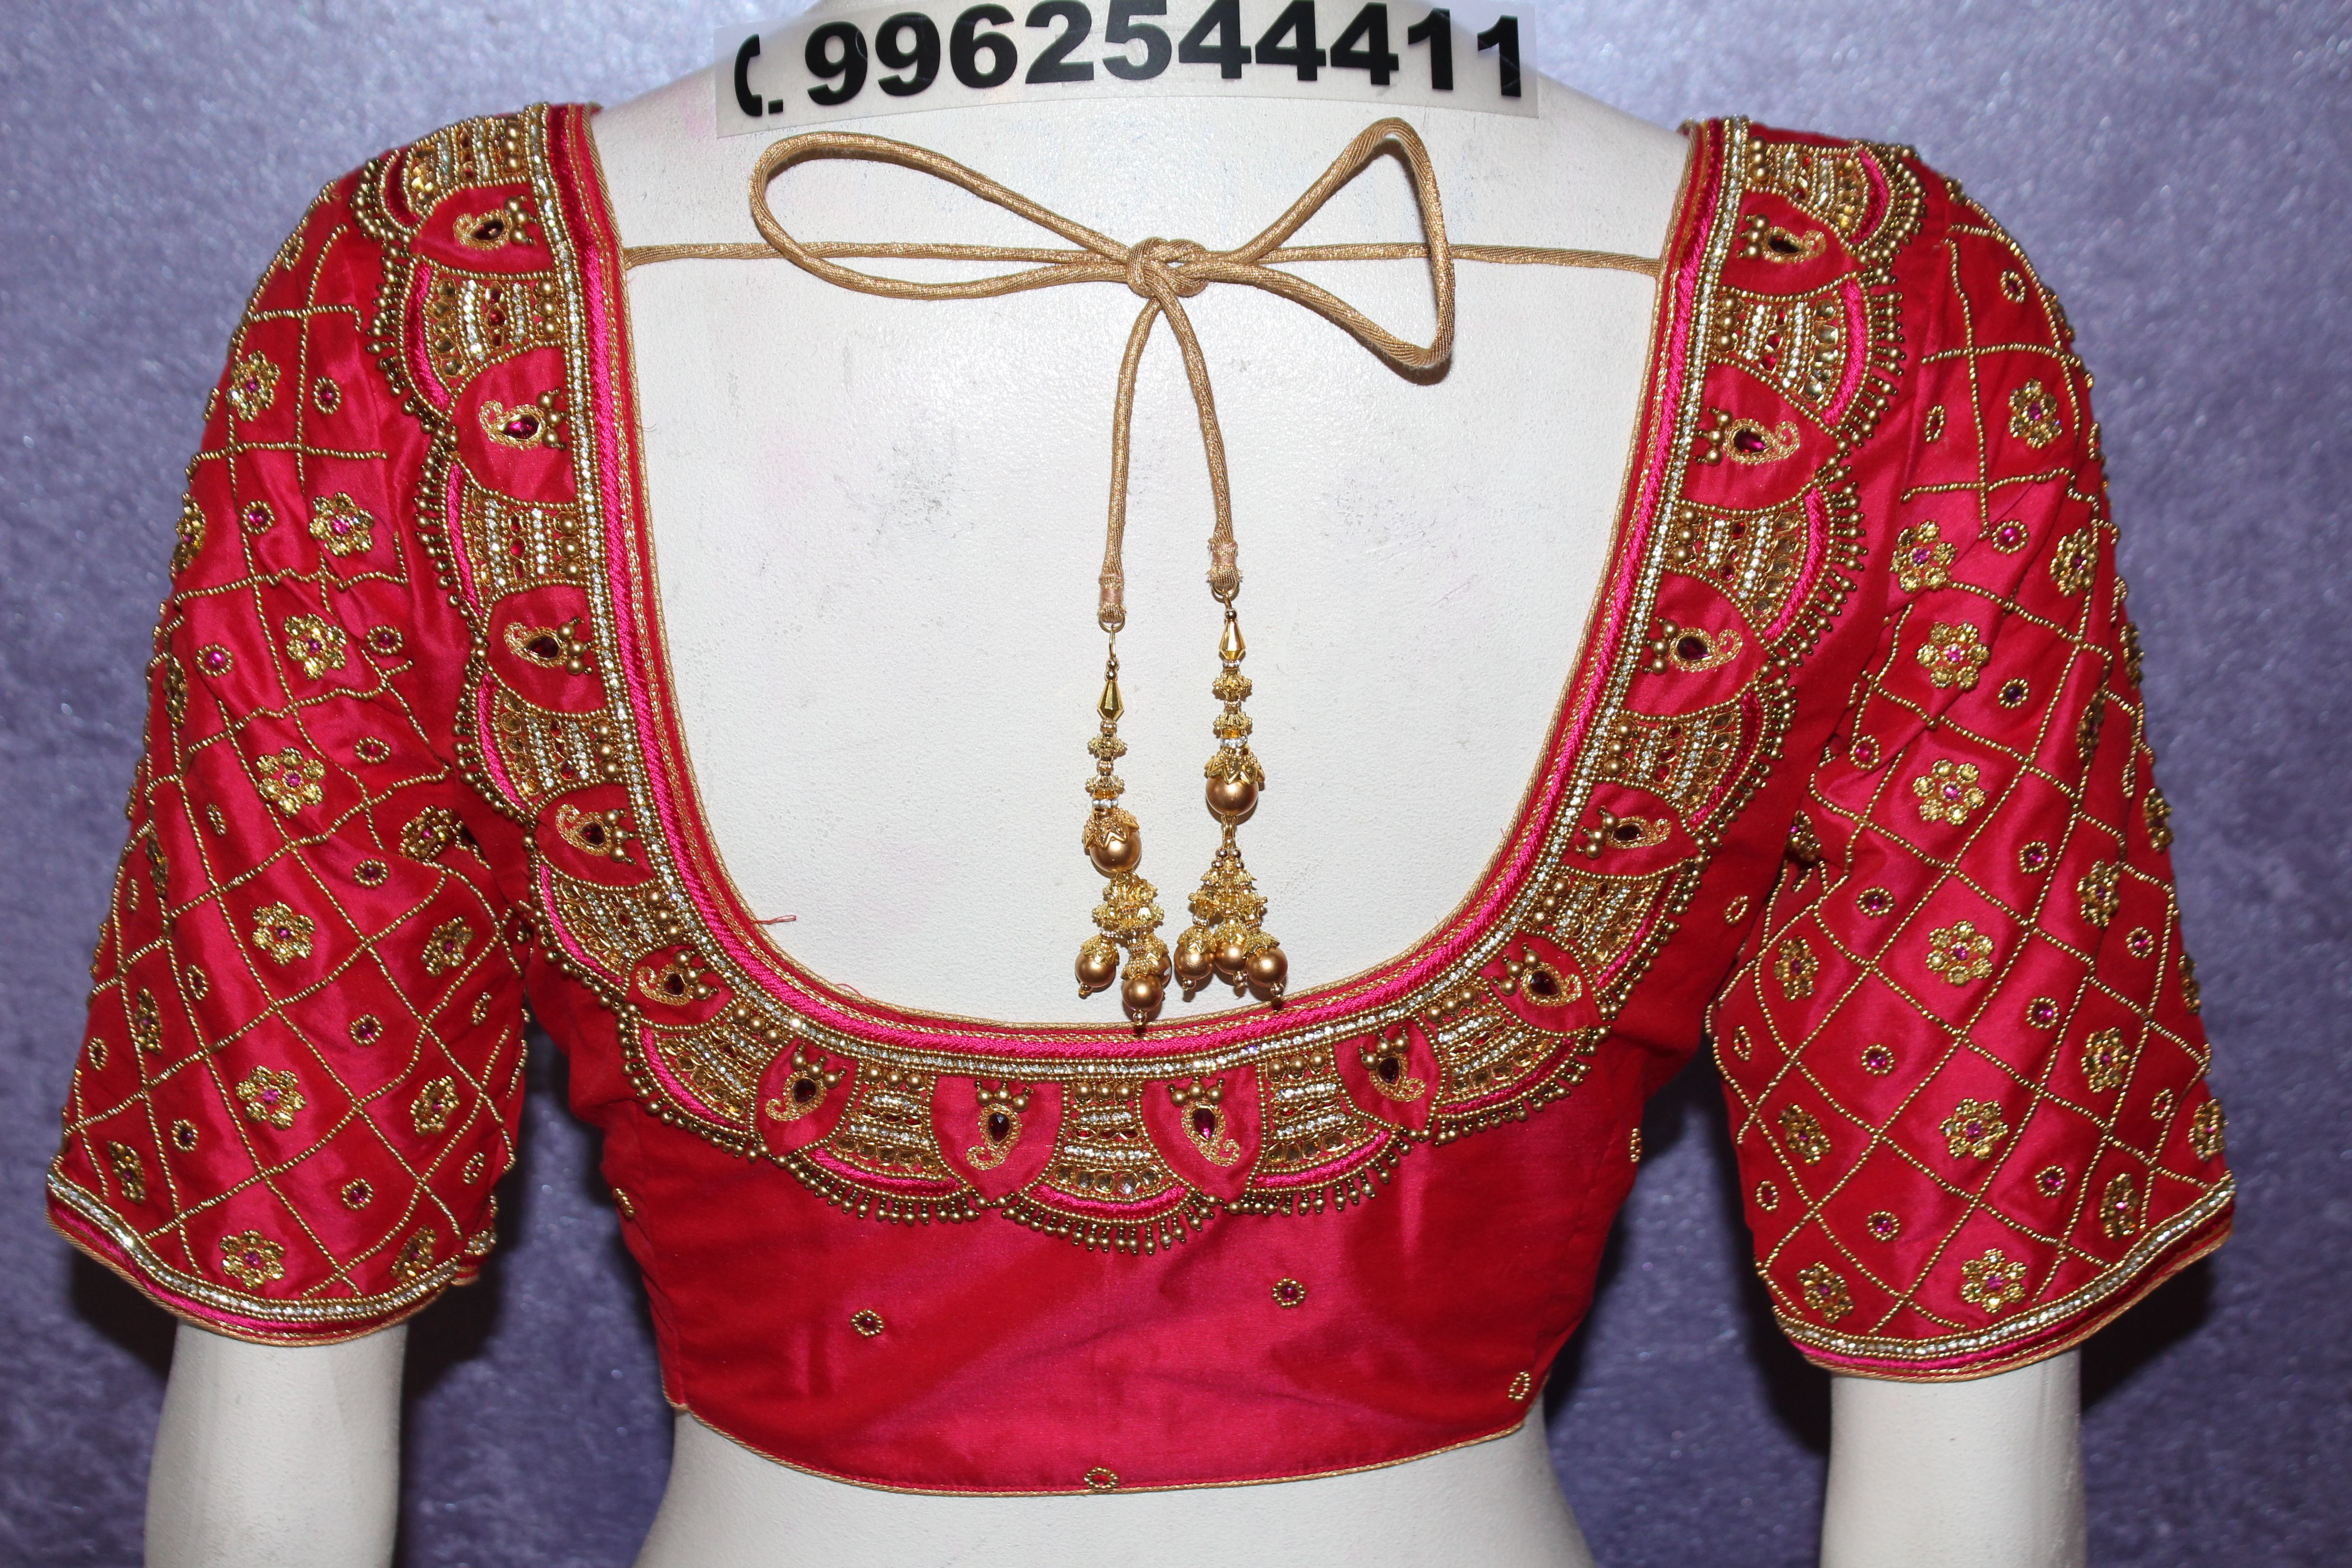 Embroidery Design Blouse At Sthri Ladies Fashion Designer Dress Suits Designer Blouse Saree Blouse Designs Blouse Work Designs Bridal Boutique Sewing Dresses